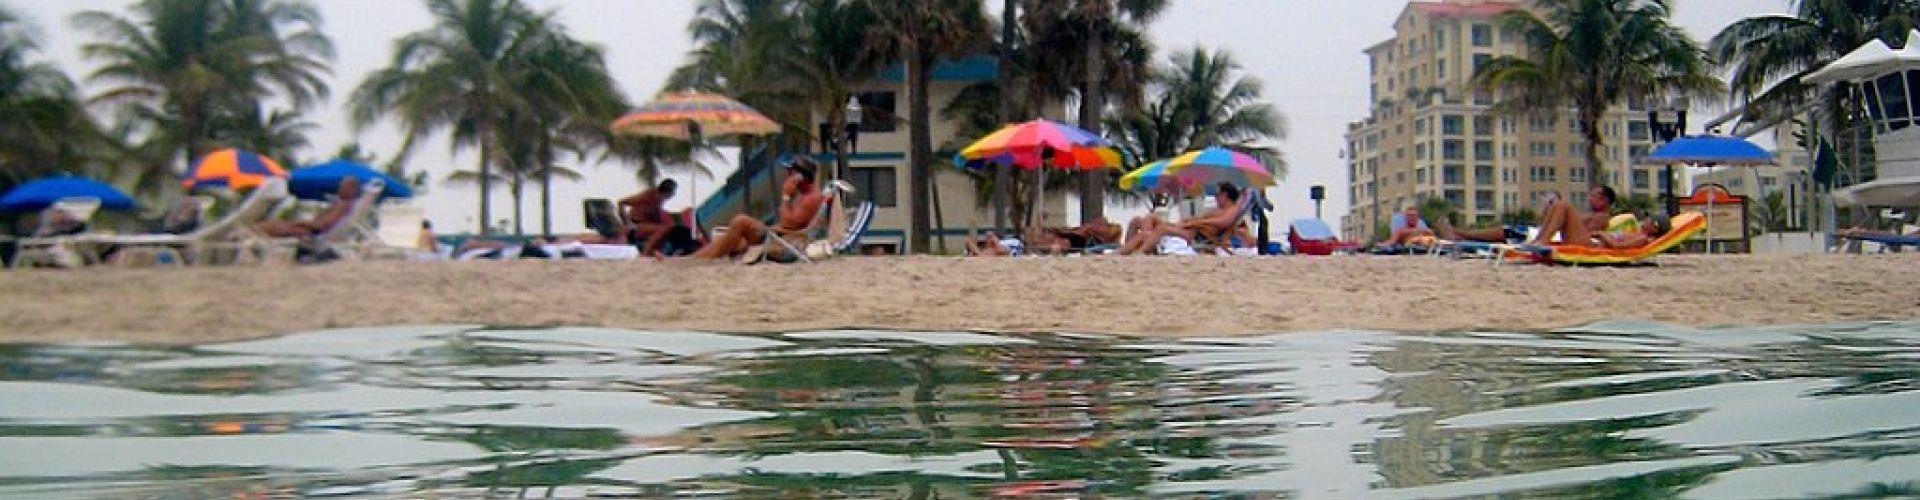 Sebastian Street Beach Public Water Fun Fort Lauderdale Reviews Ellgeebe